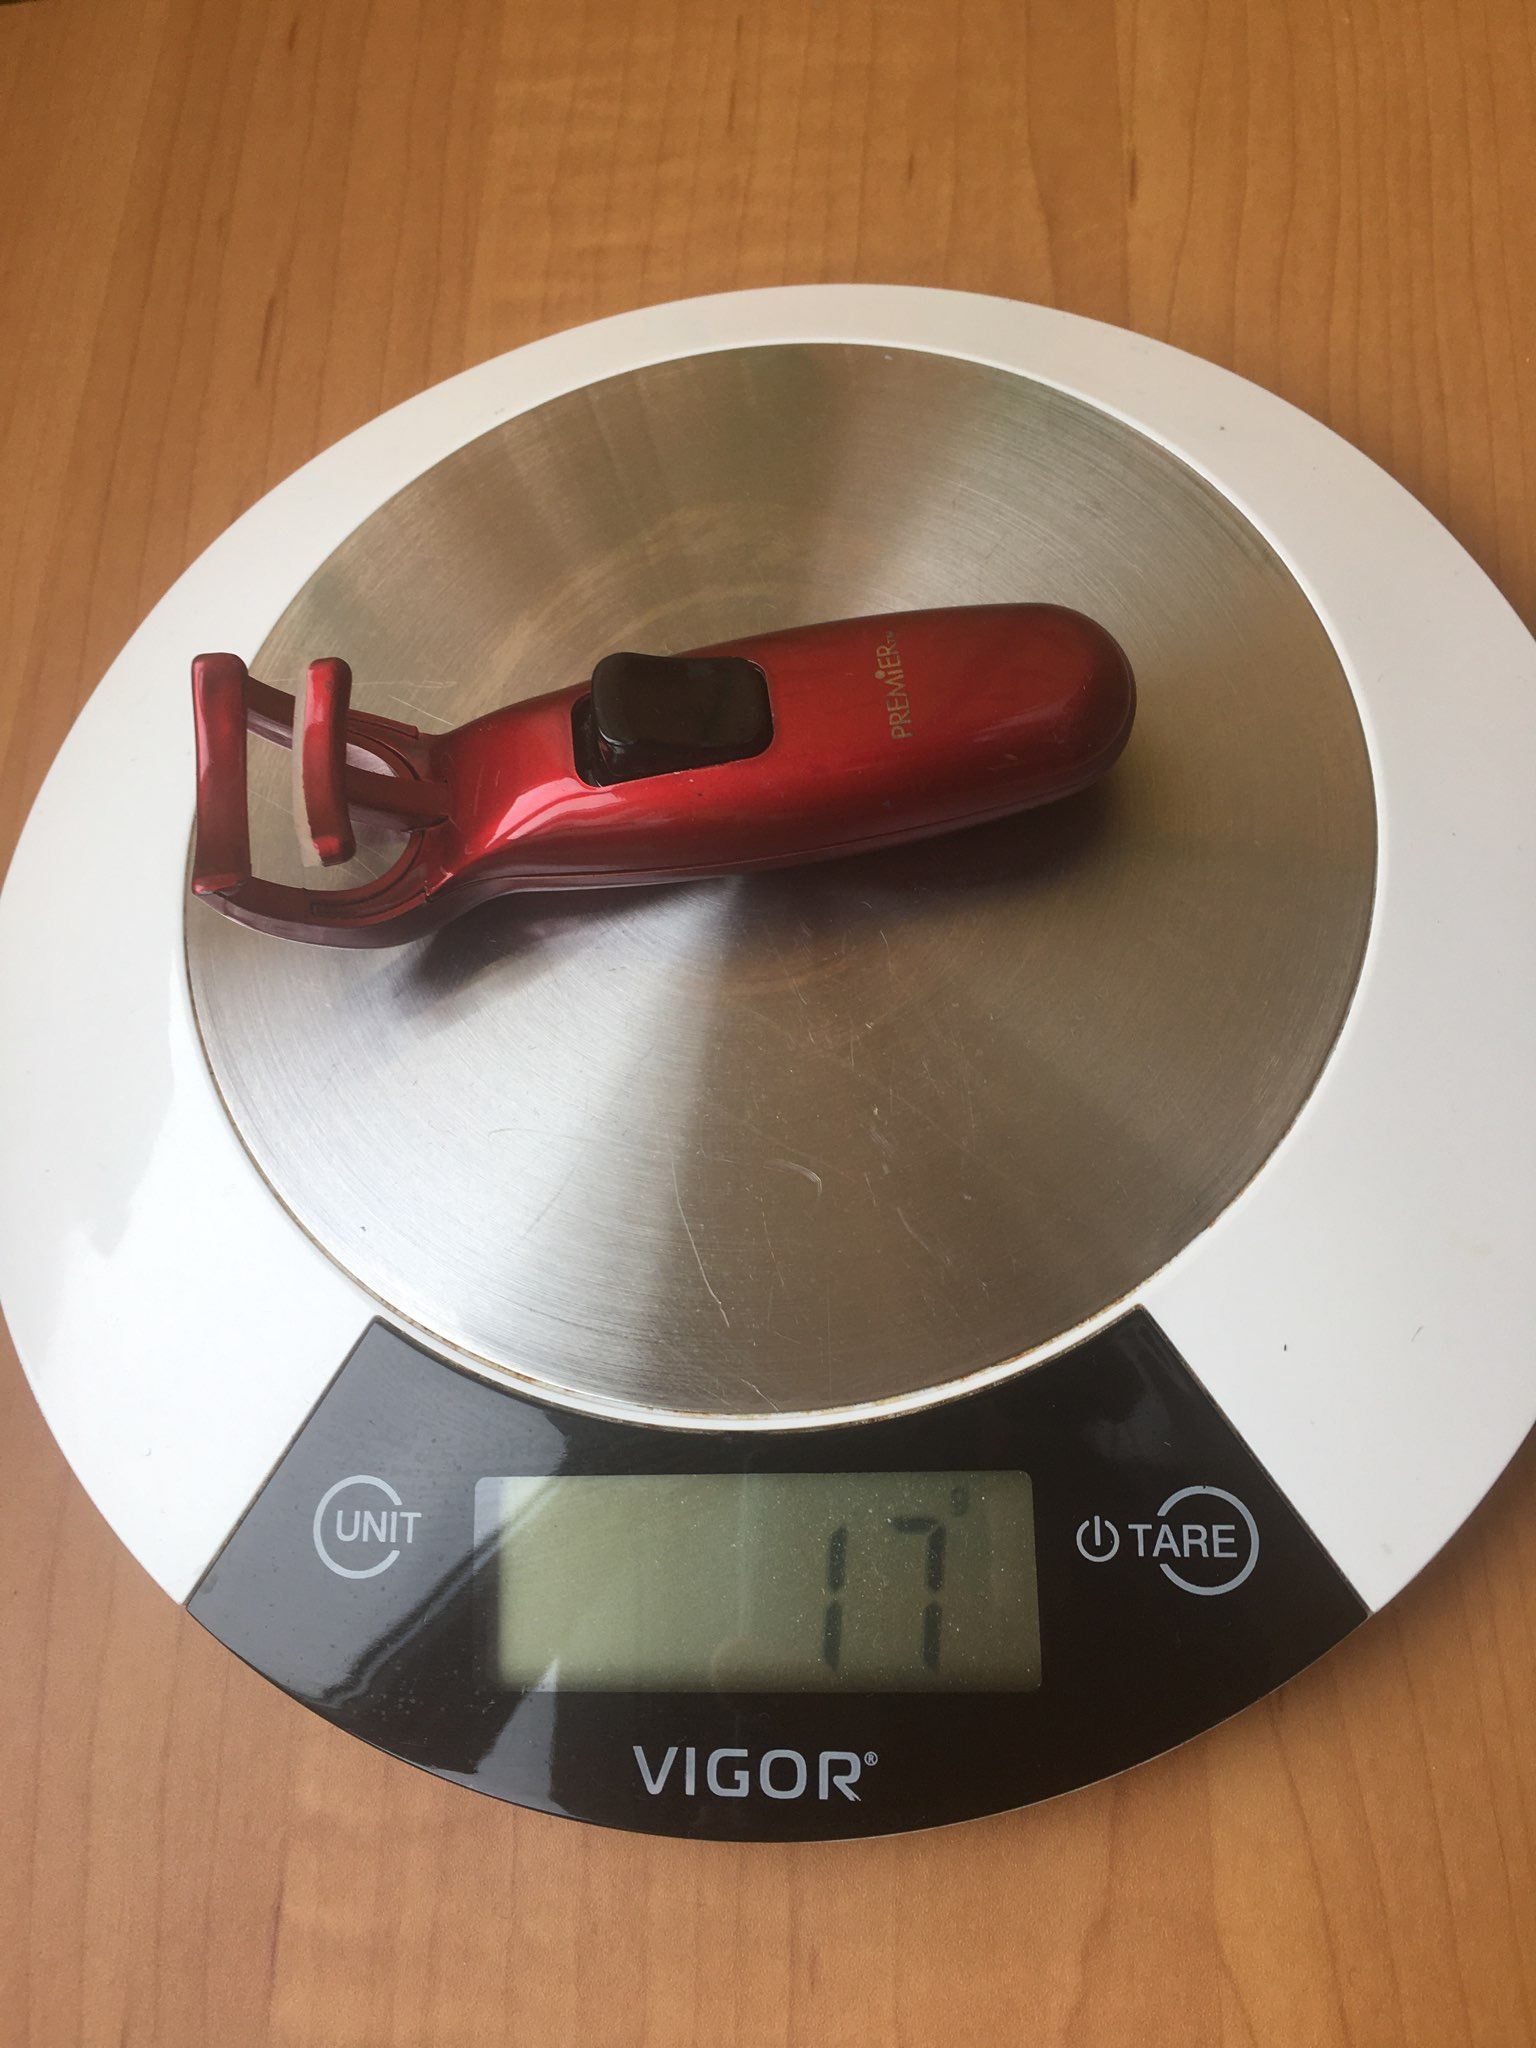 вес щипцов для ресниц